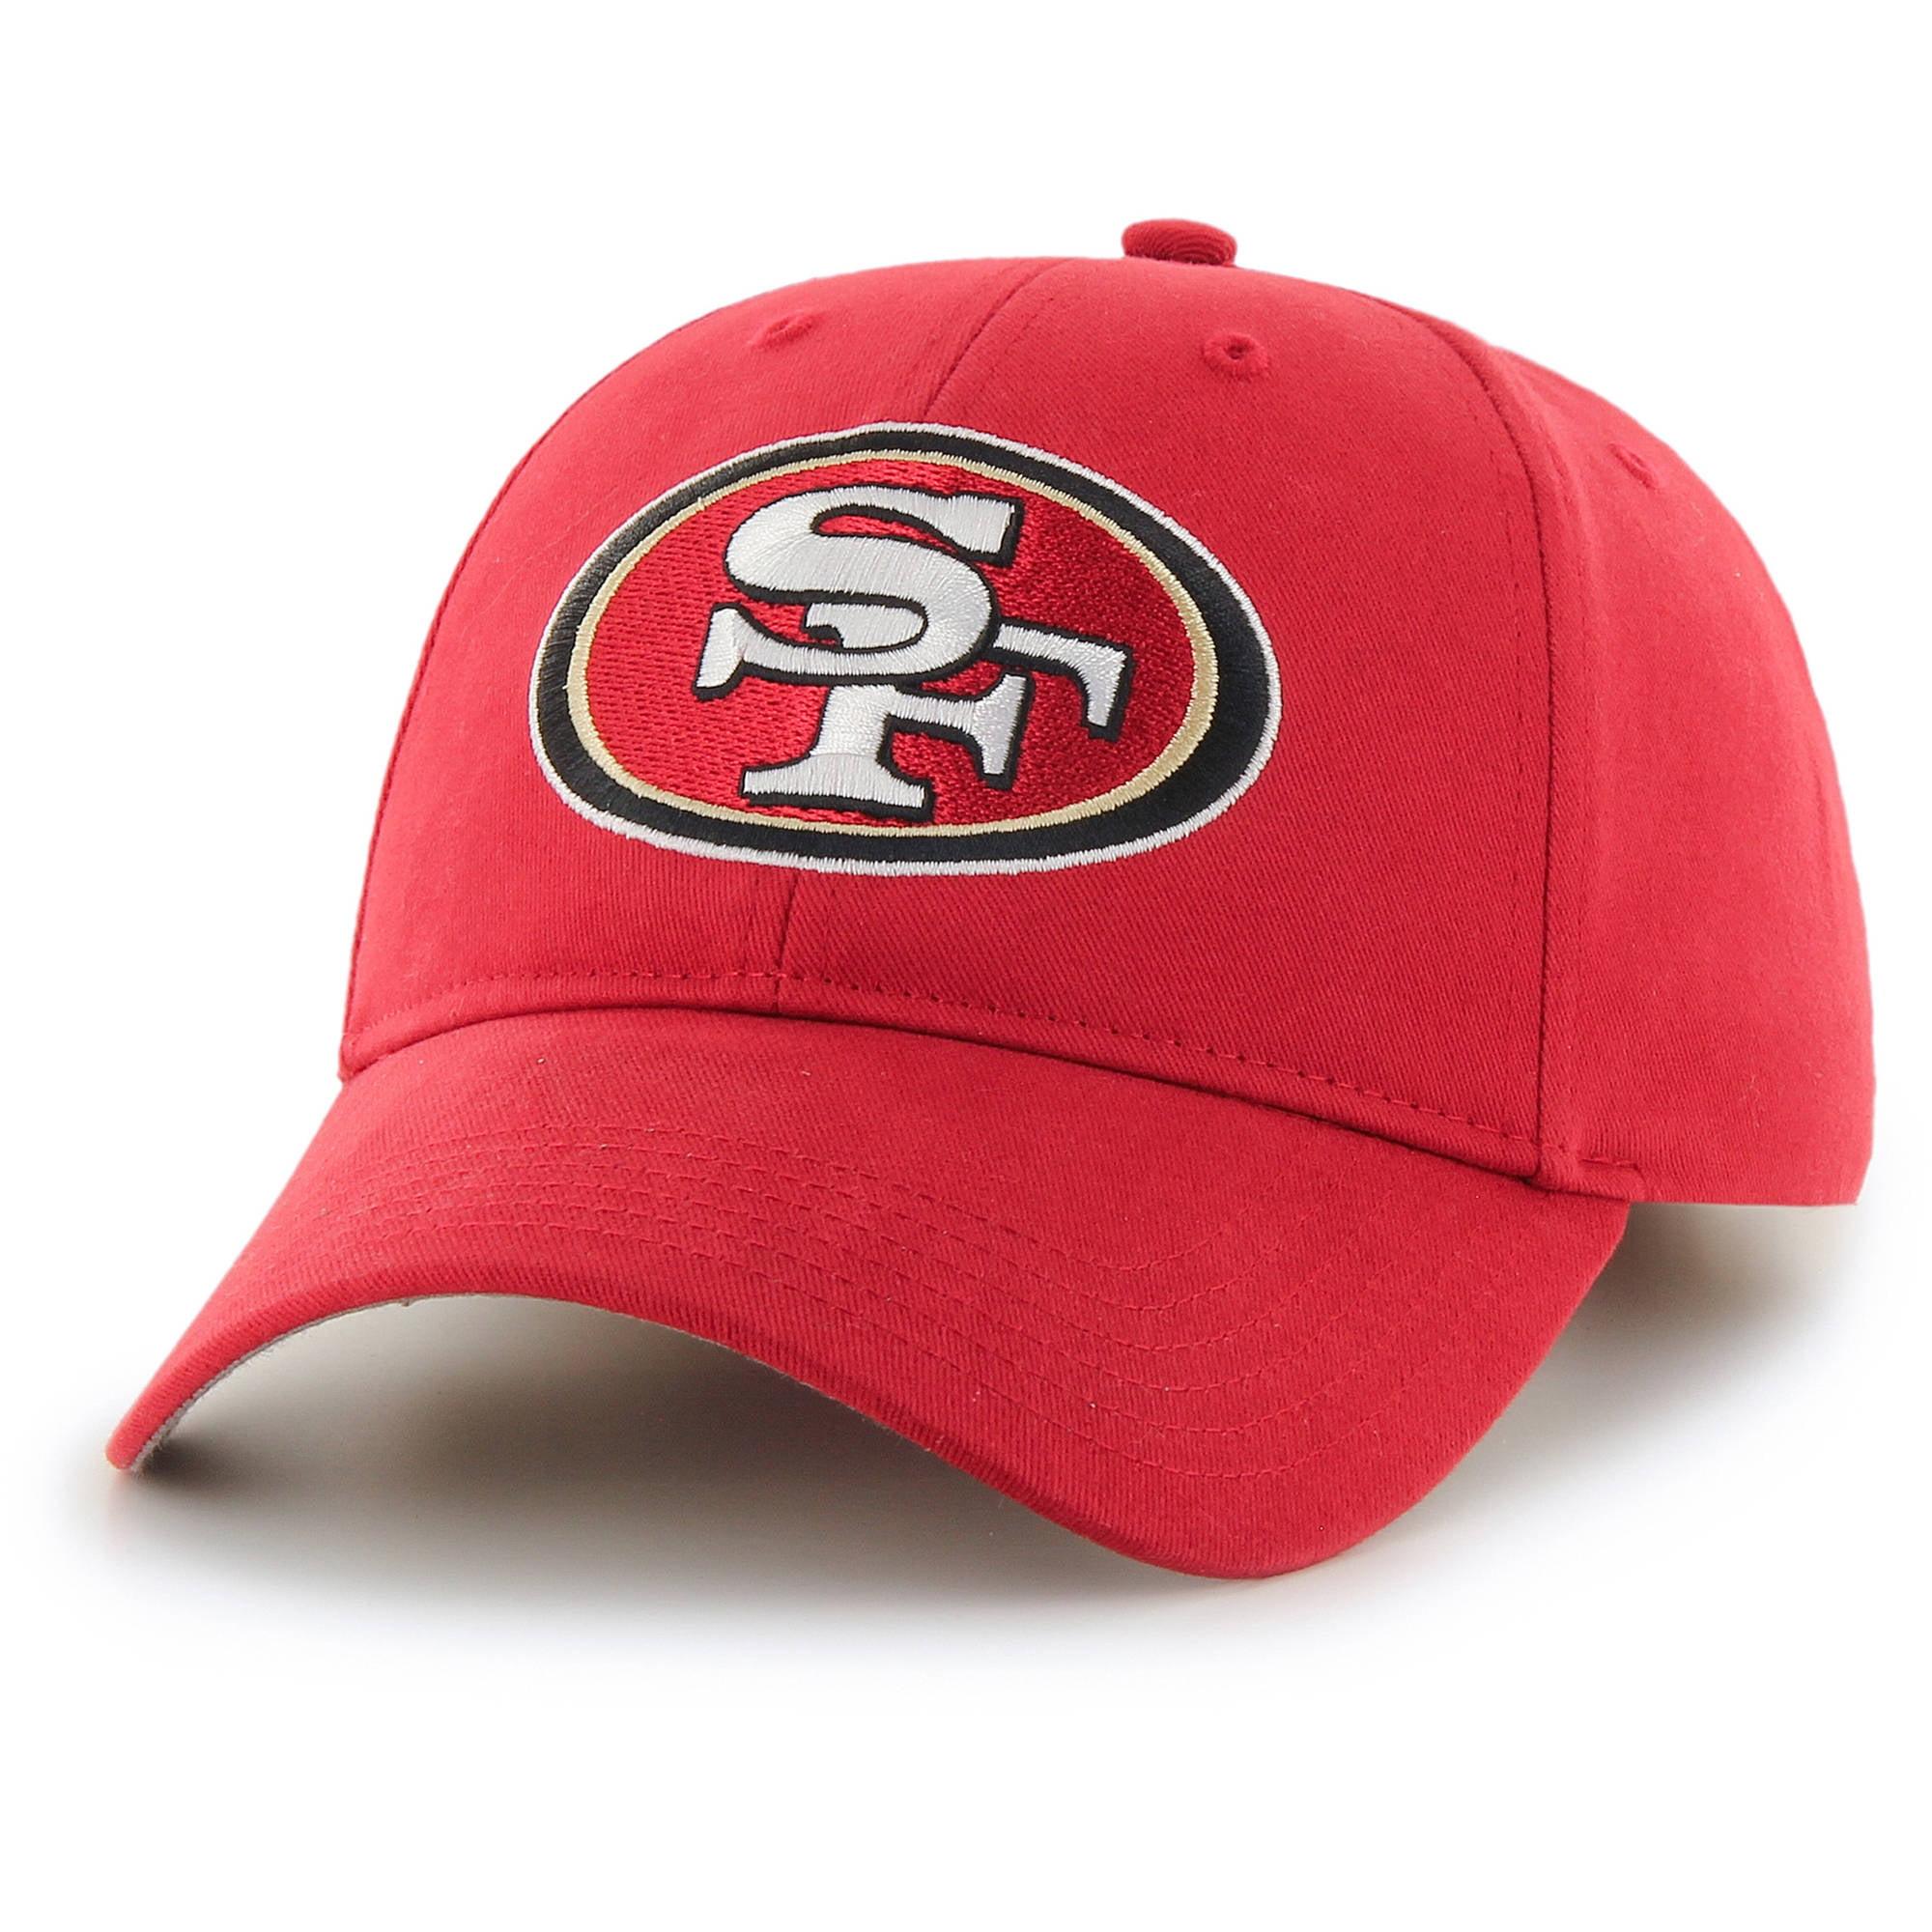 NFL San Francisco 49ers Basic Cap   Hat by Fan Favorite by Overstock